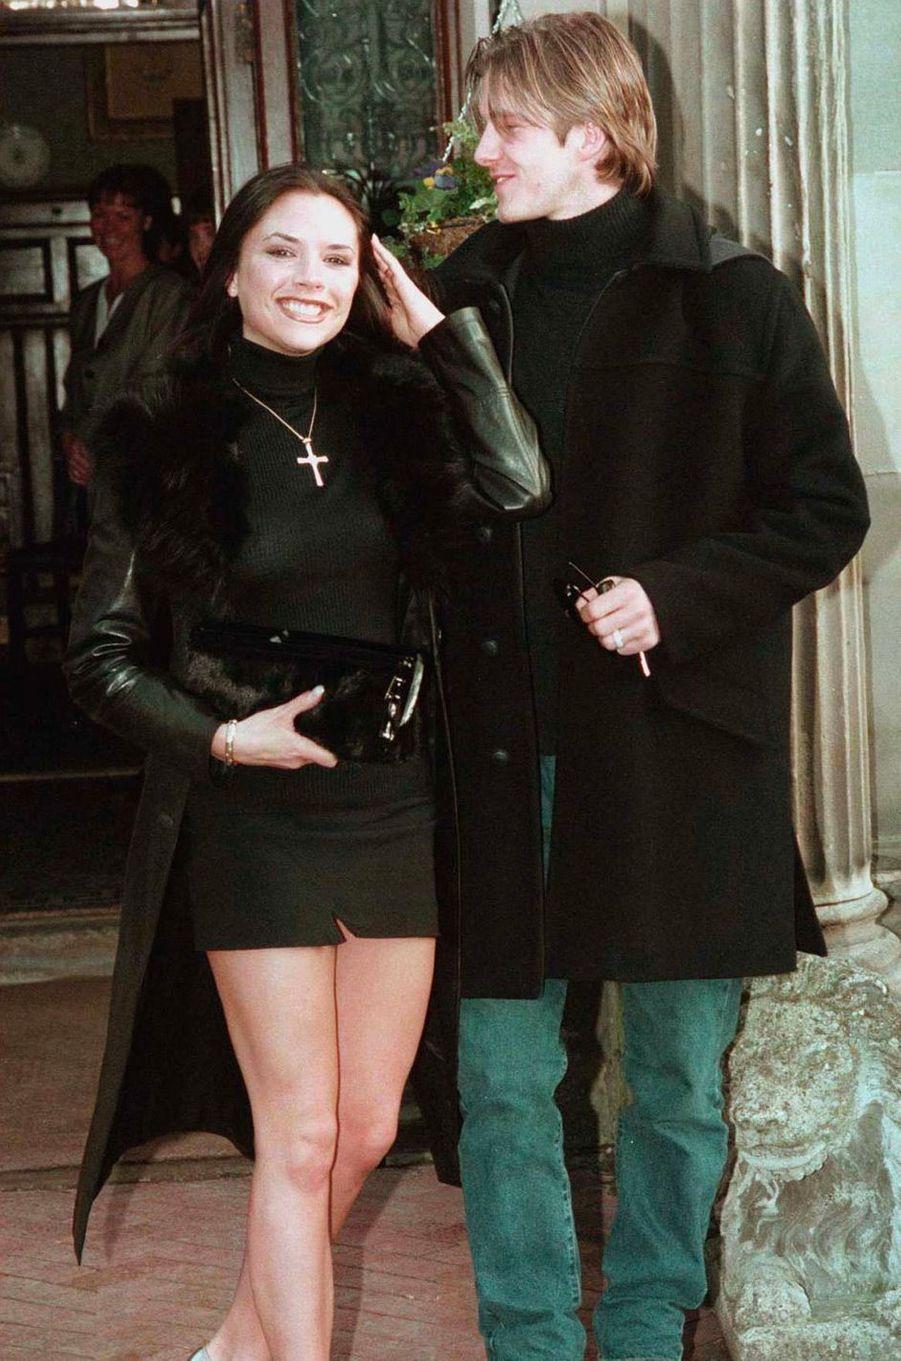 Victoria Beckham, aka Posh Spice, avec David Beckham le 25 janvier 1998